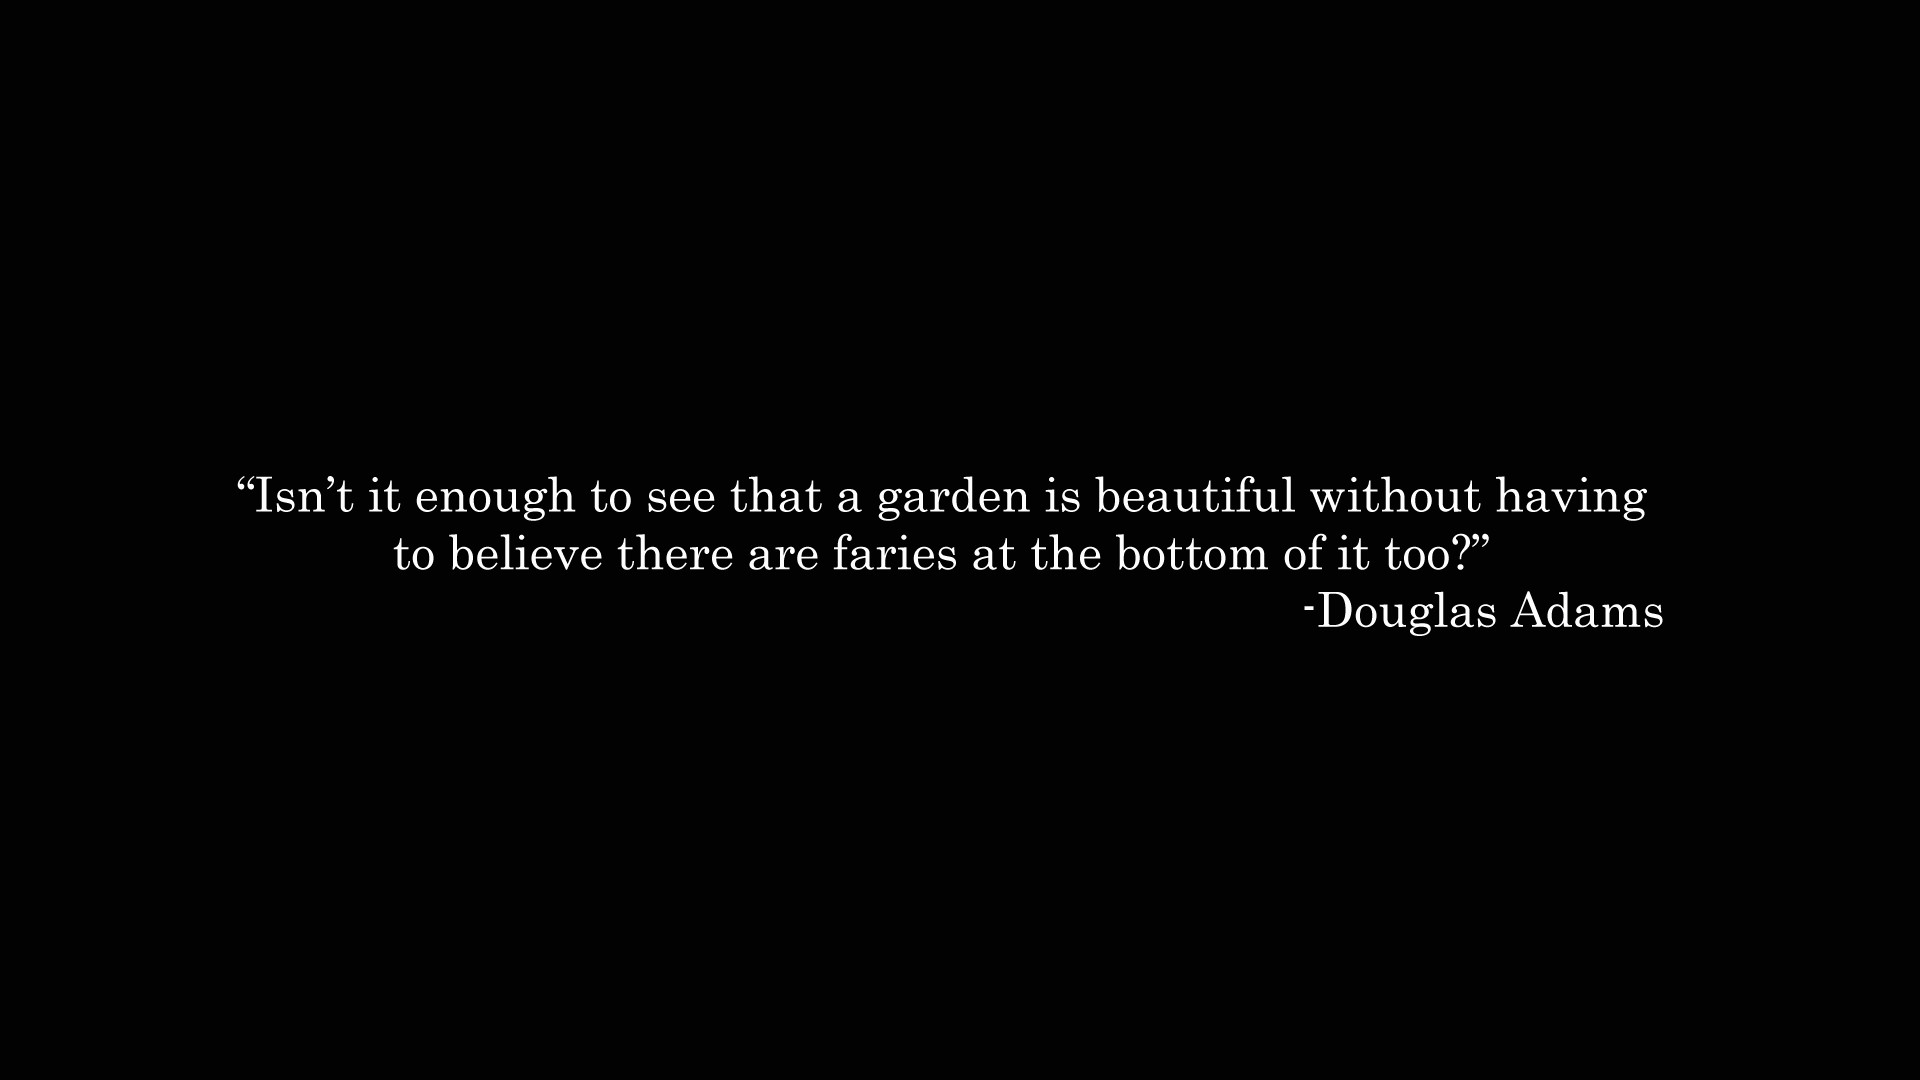 Douglas Adams's quote